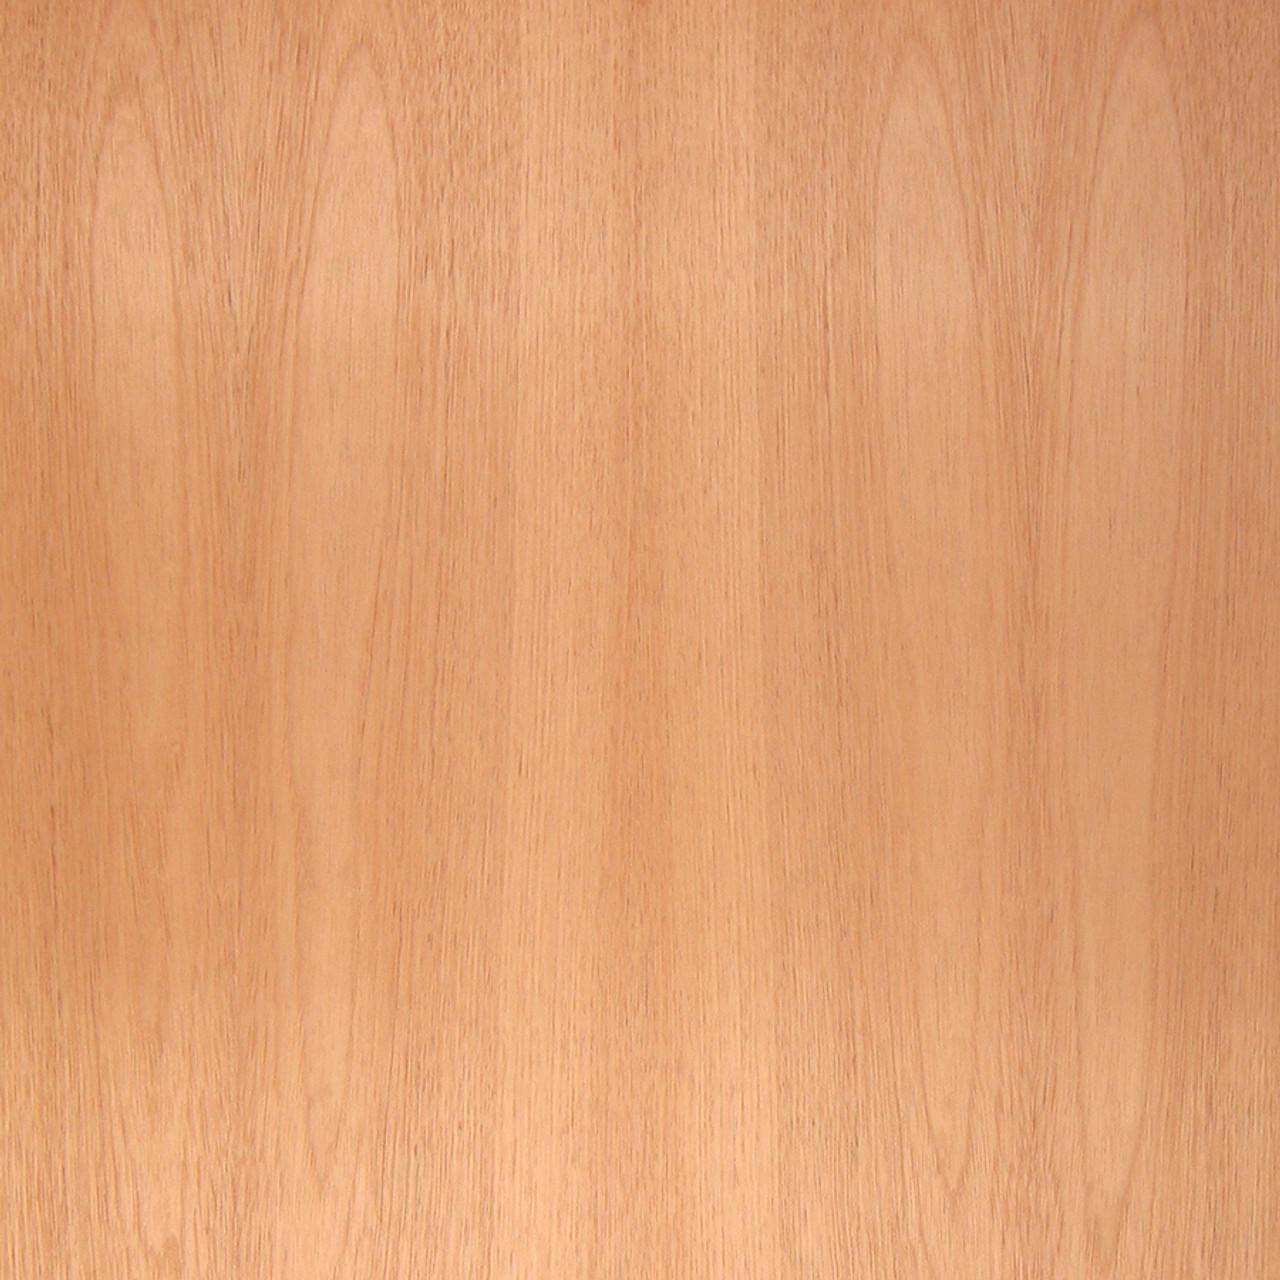 Cedar Veneer Spanish Exotic Wood Veneers Sheets Humidor Oakwood Veneer Company